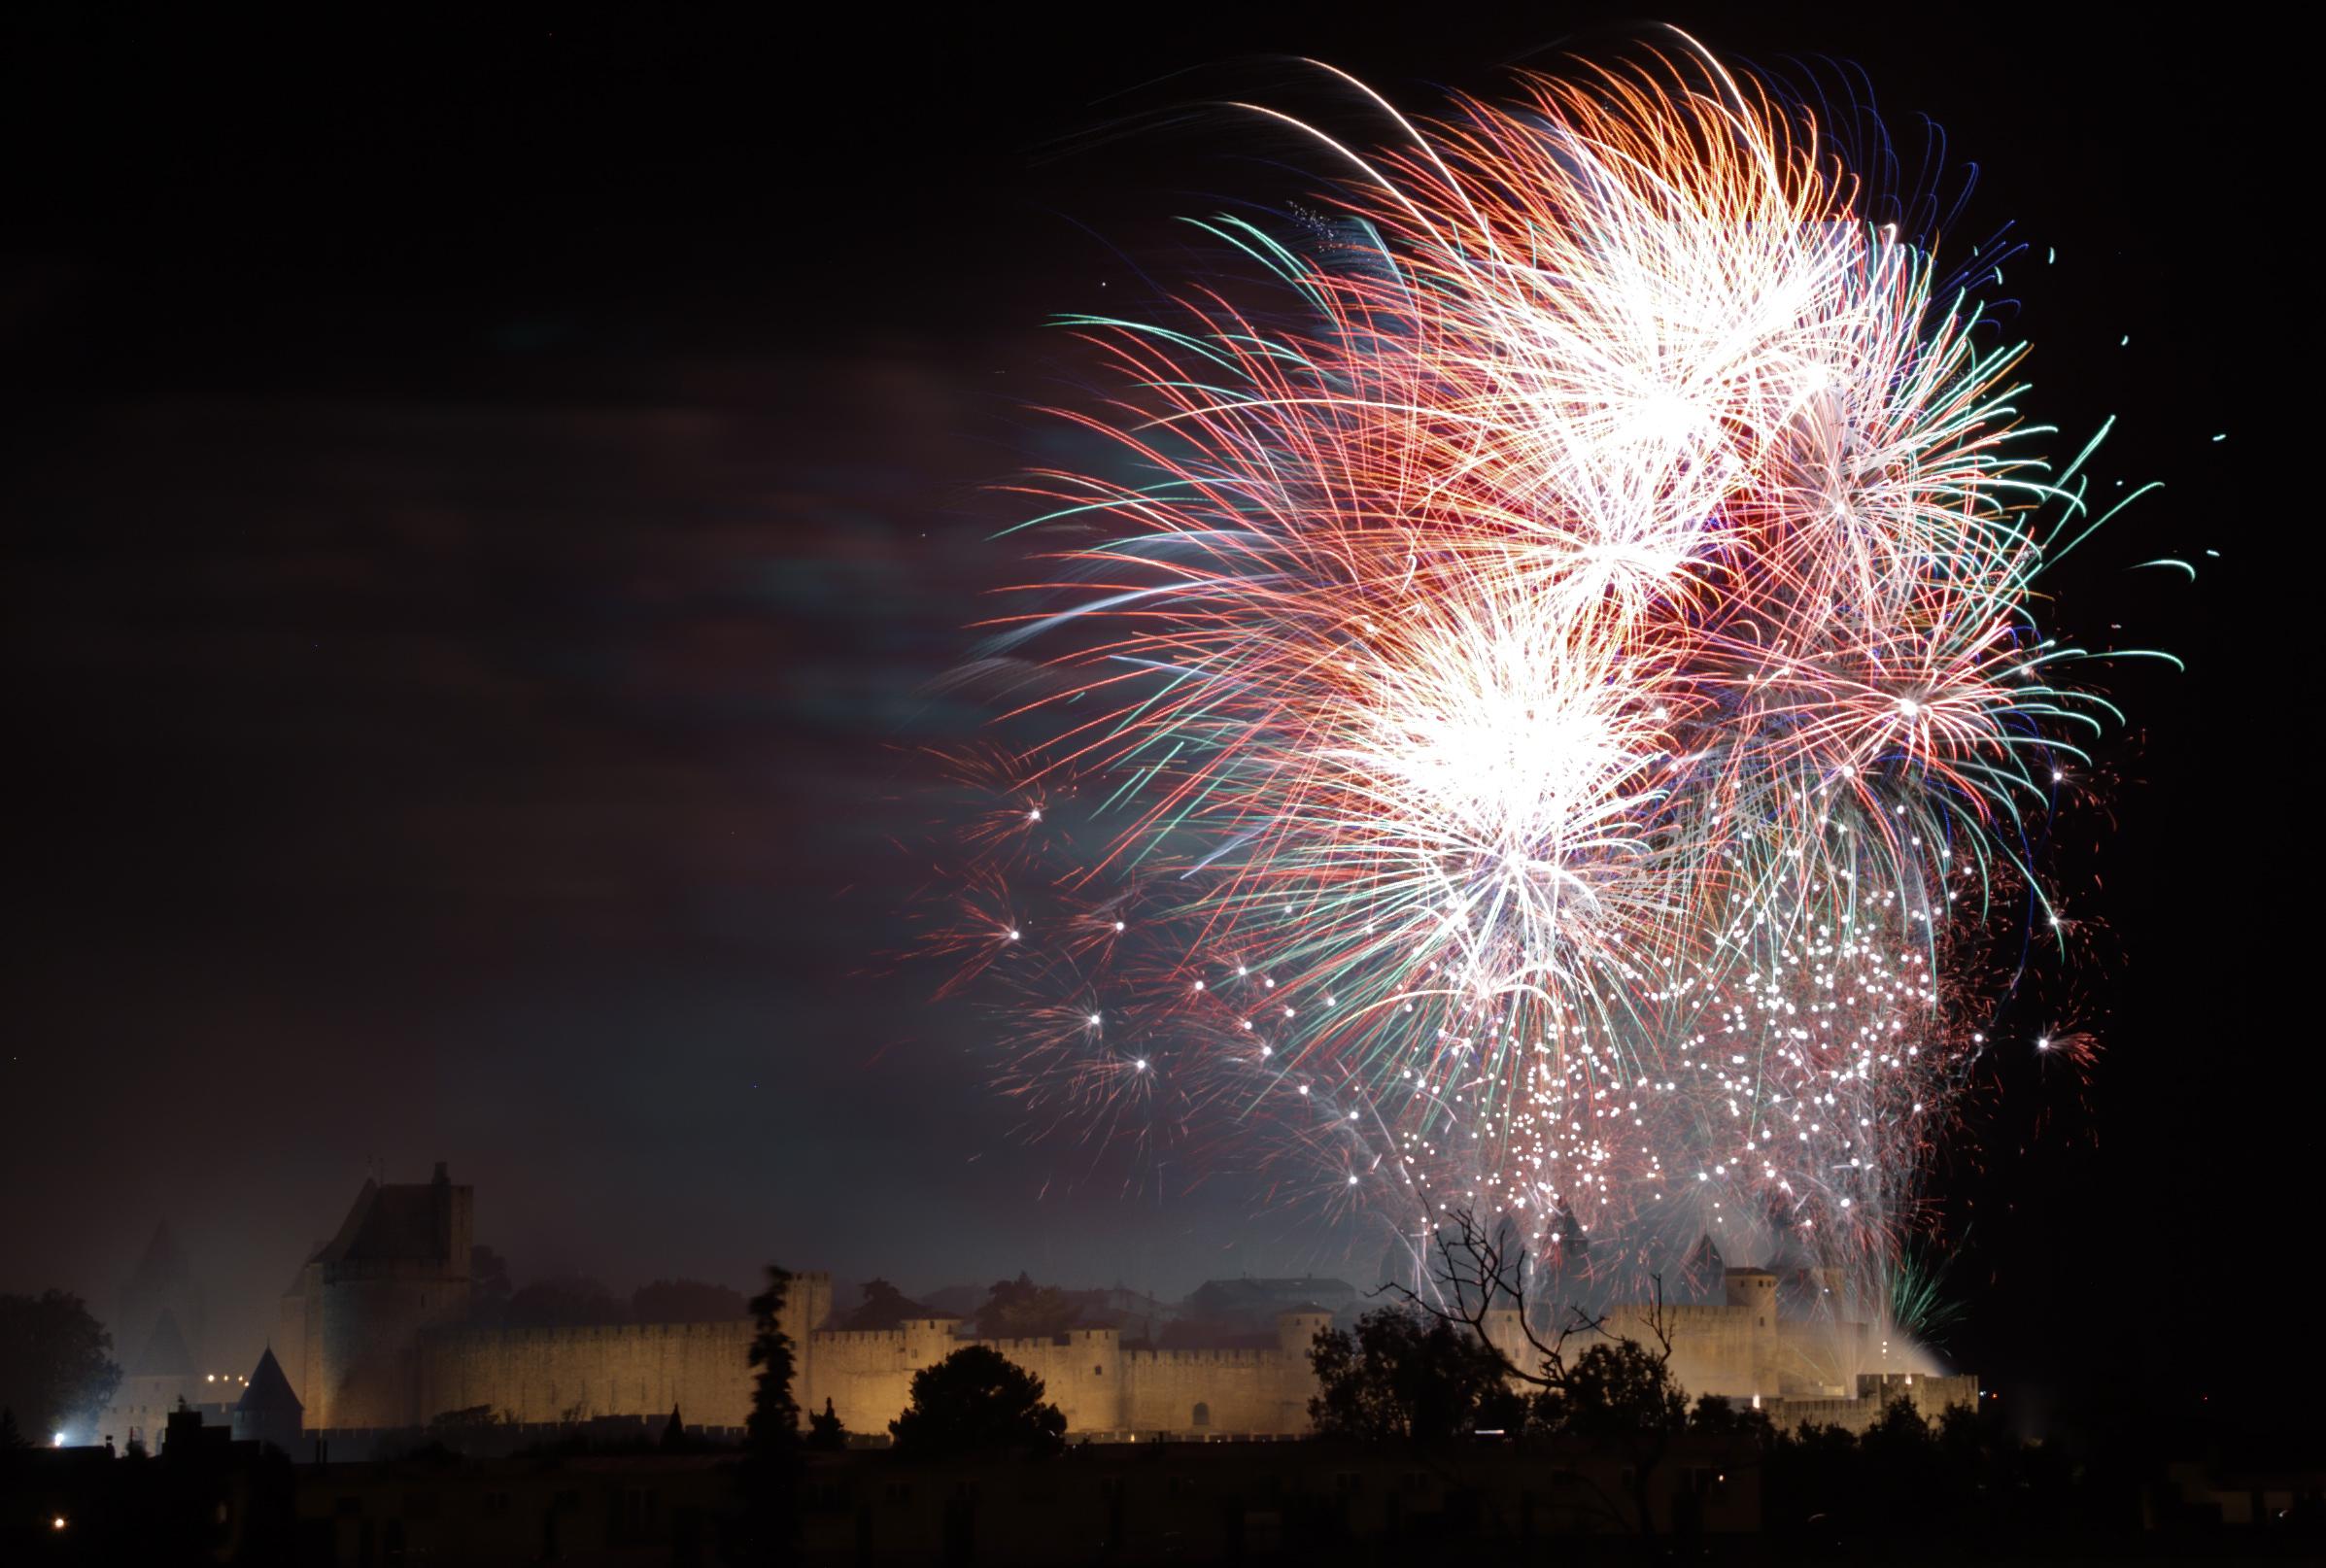 Le 14 juillet Artifice-Carcasonne